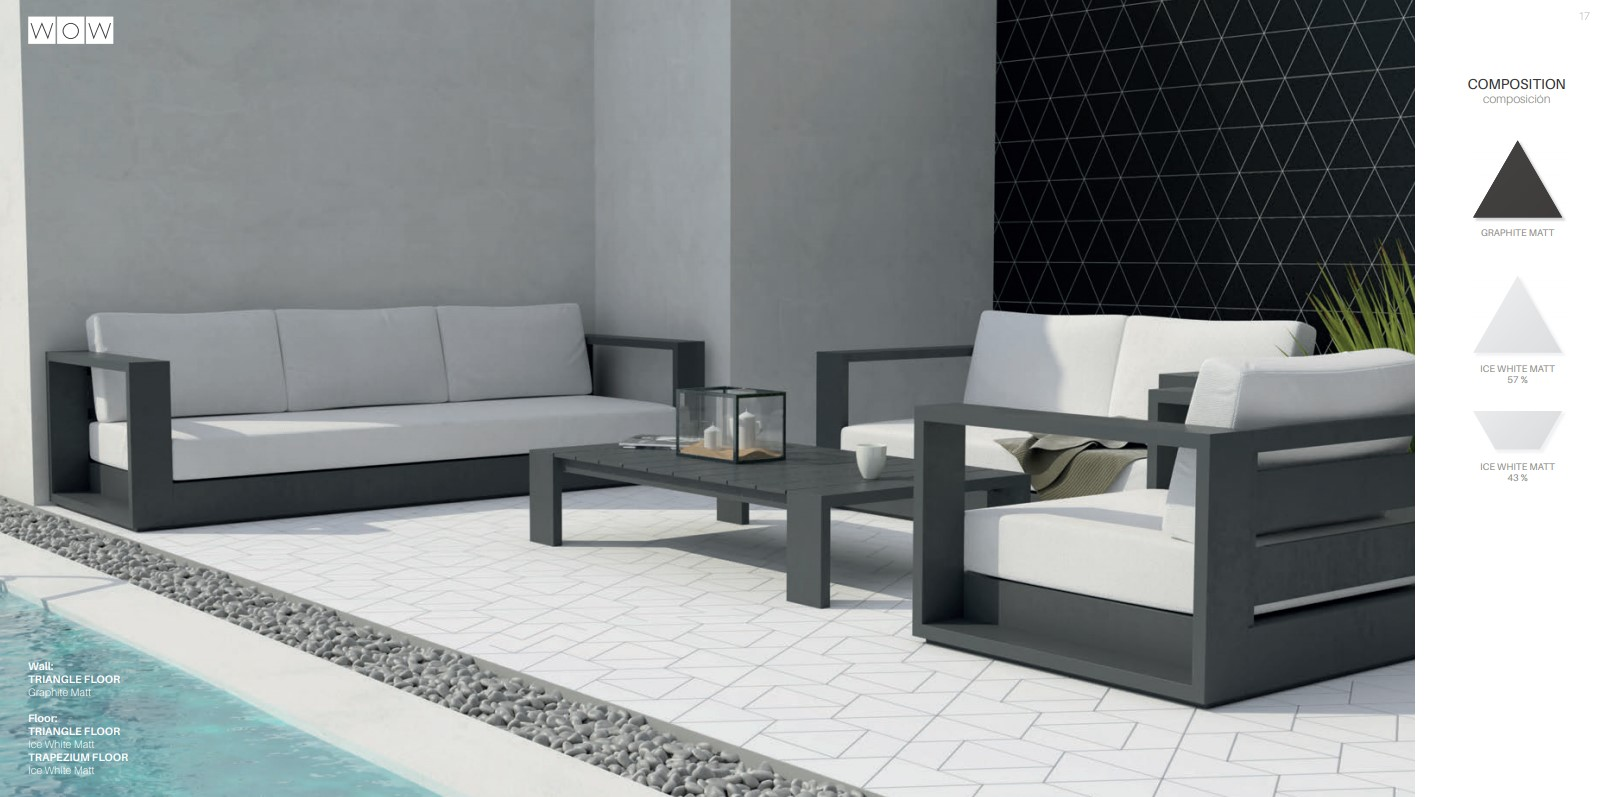 Floor Tiles Ice White Matte Triangles & Trapezium with Graphite Matte Triangle Wall